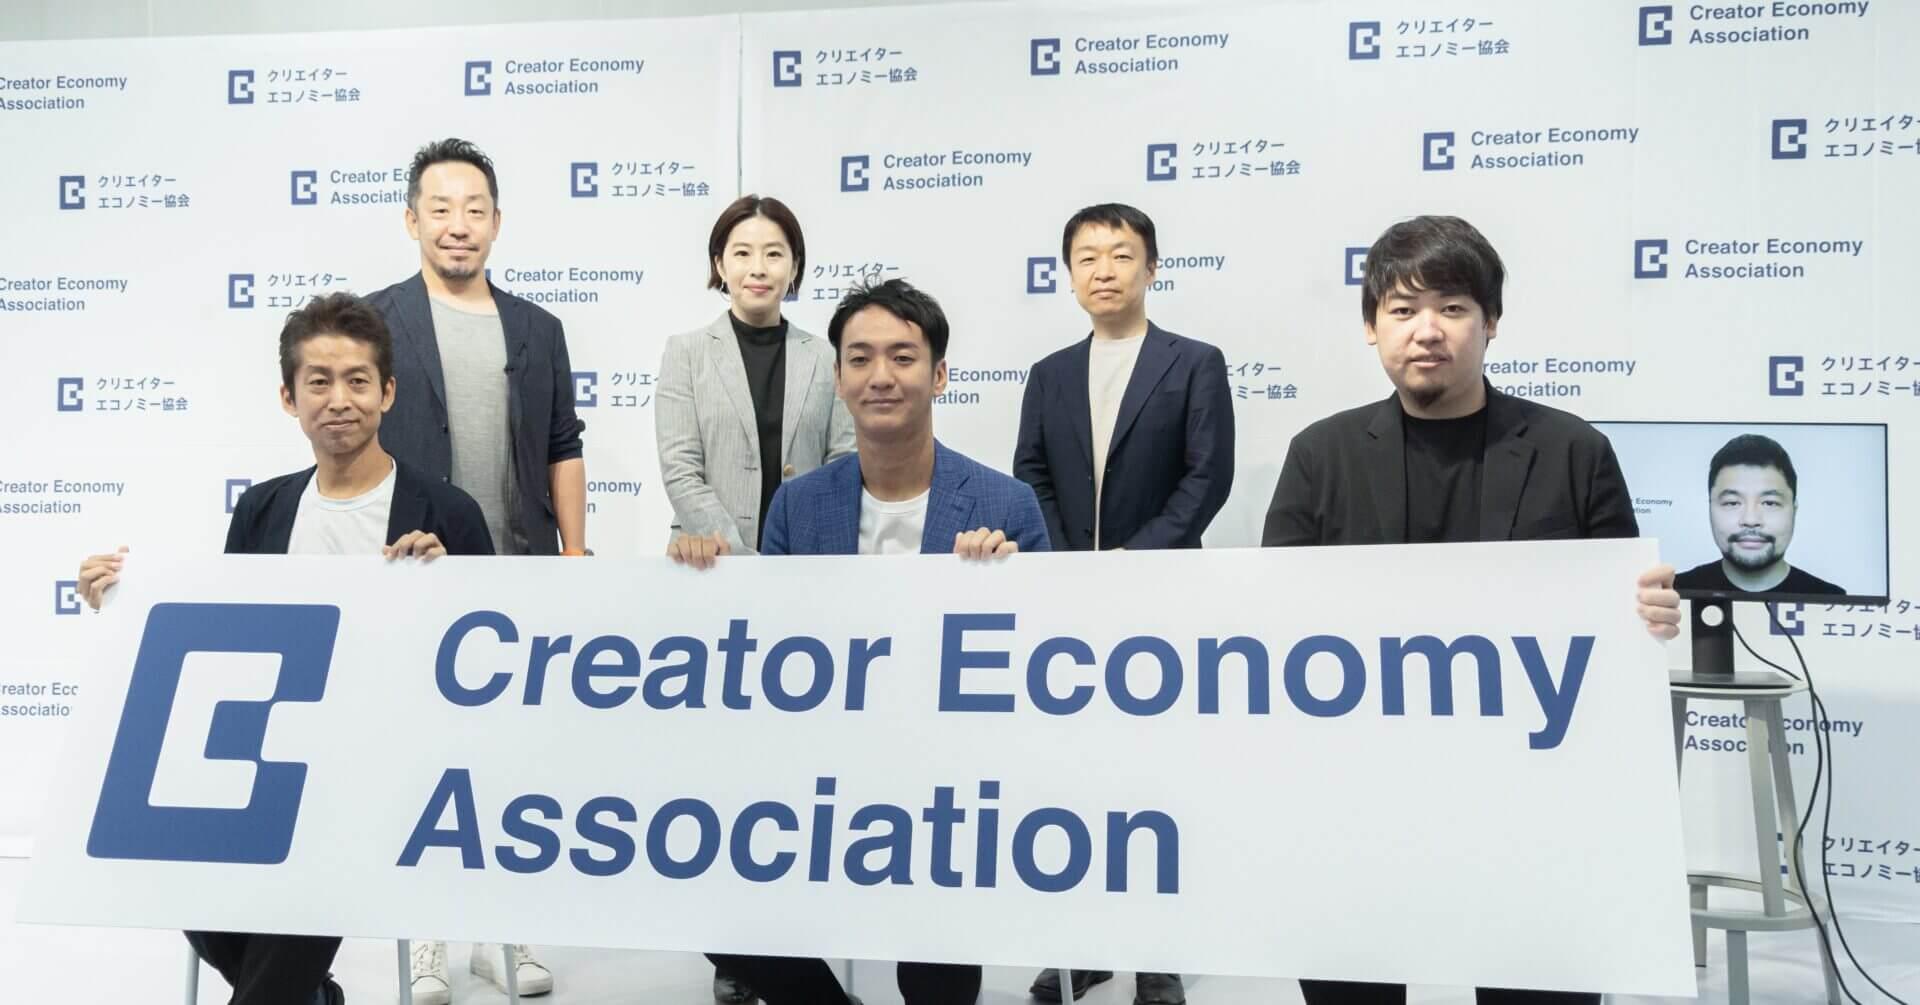 BASE、note、UUUMなど7社がクリエイターのための協会を設立!|【週刊】お役立ち!チップスニュース